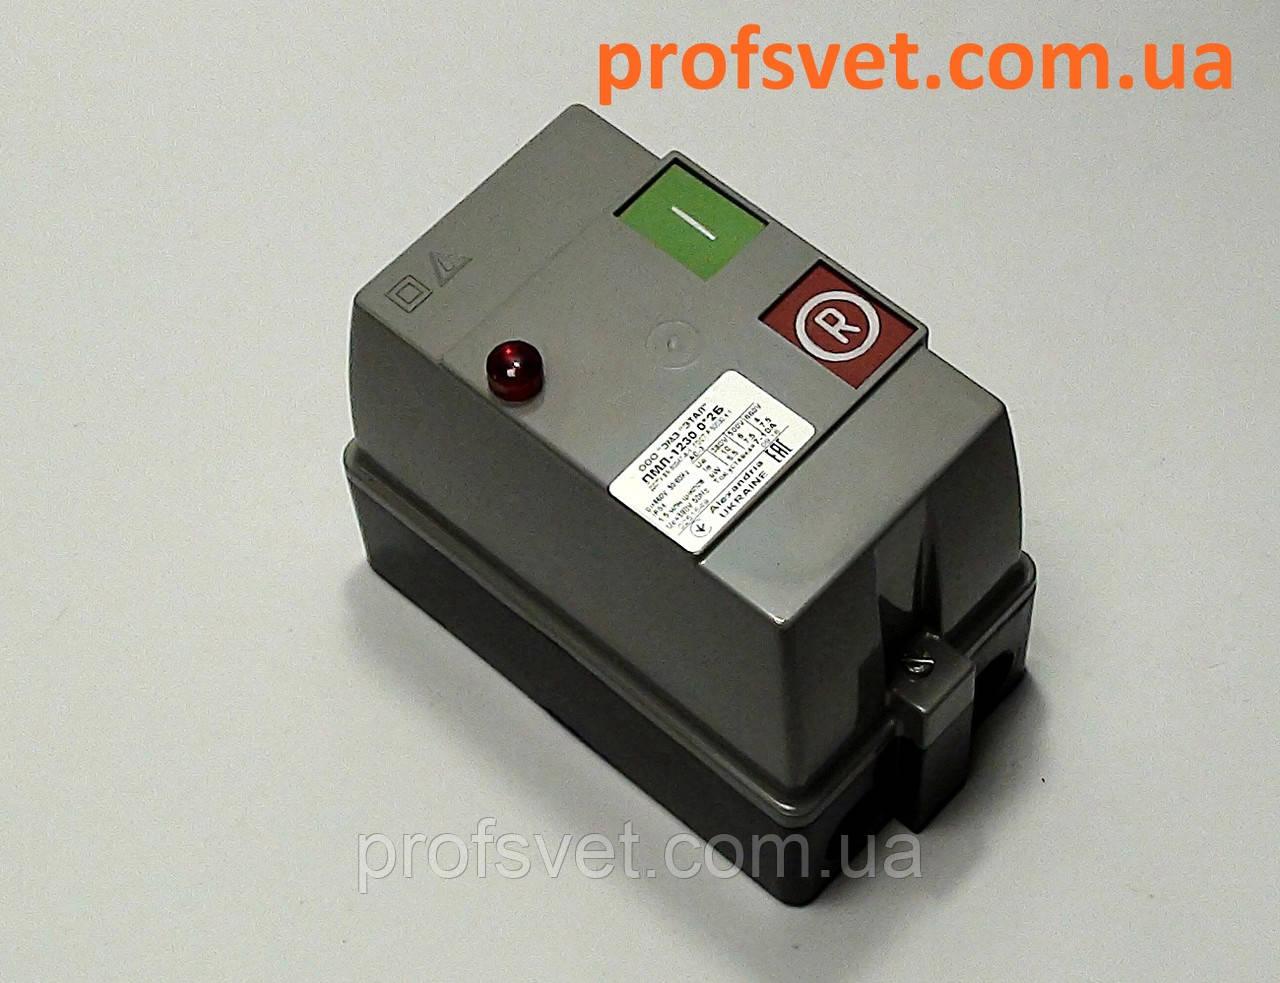 Пускач ПМЛ-1230 10а IP54 з реле кнопки лампа